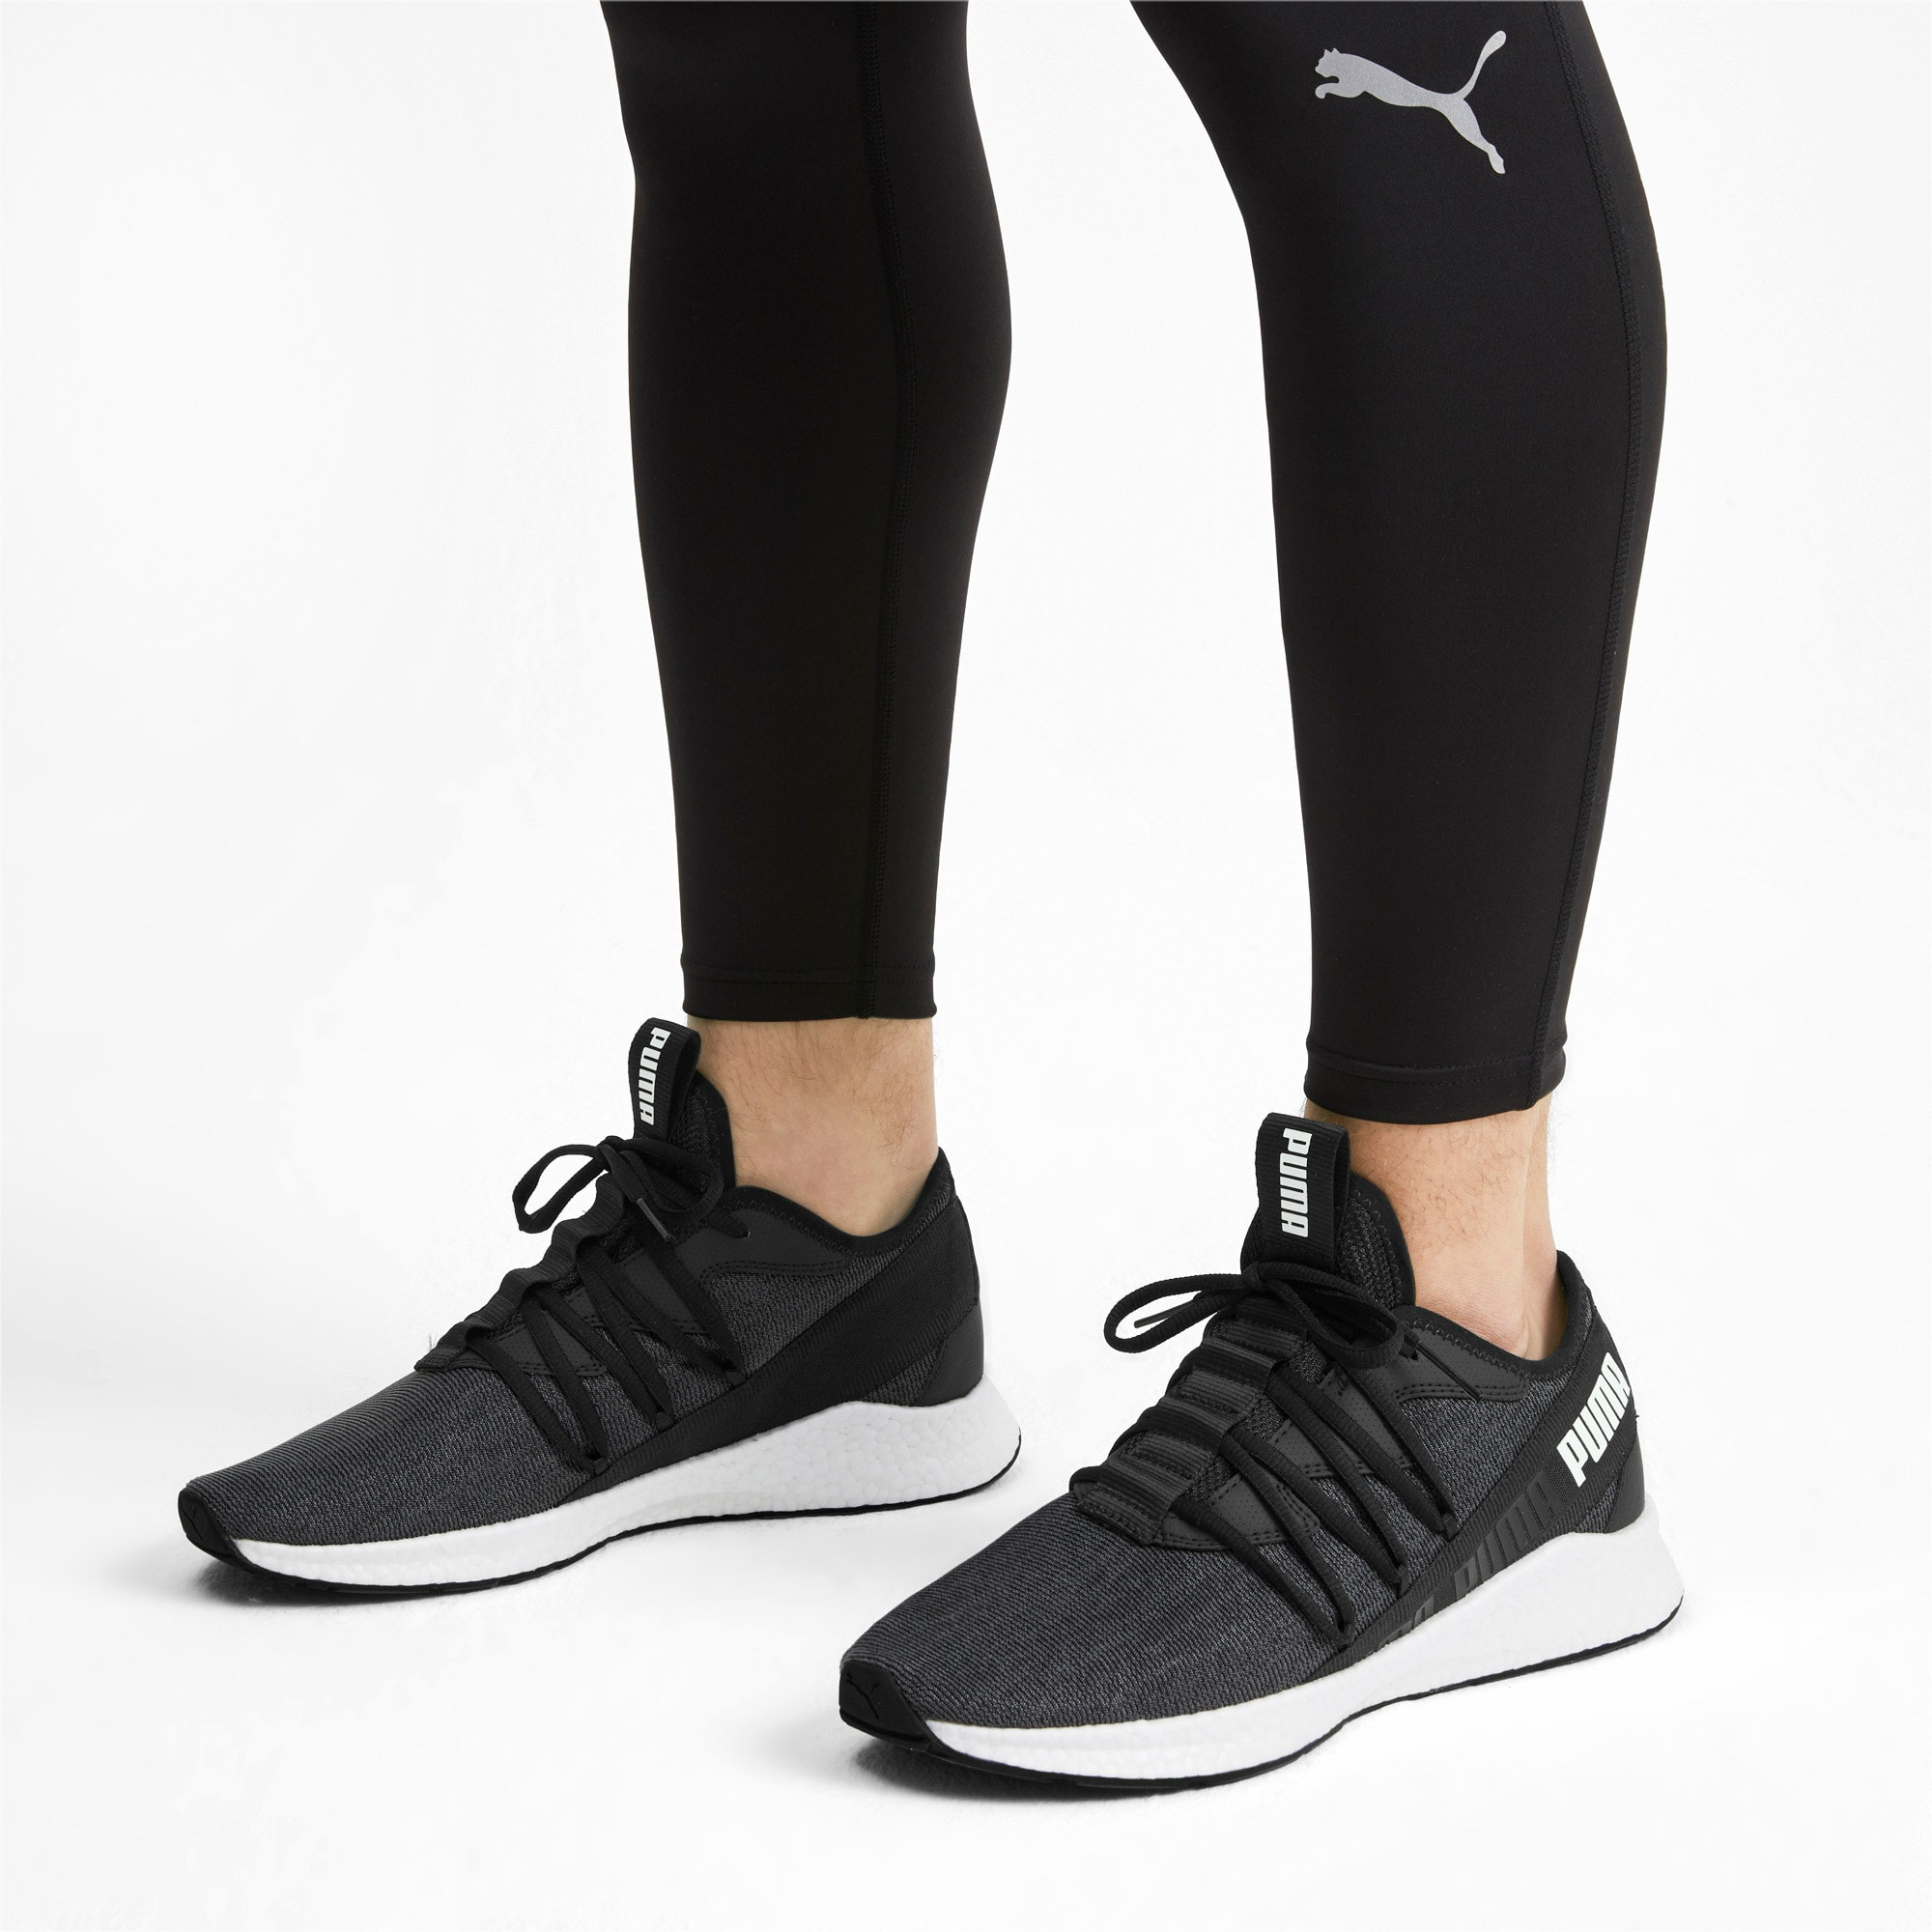 Thumbnail 2 of NRGY Star Knit Running Shoes, Puma Black-Puma White, medium